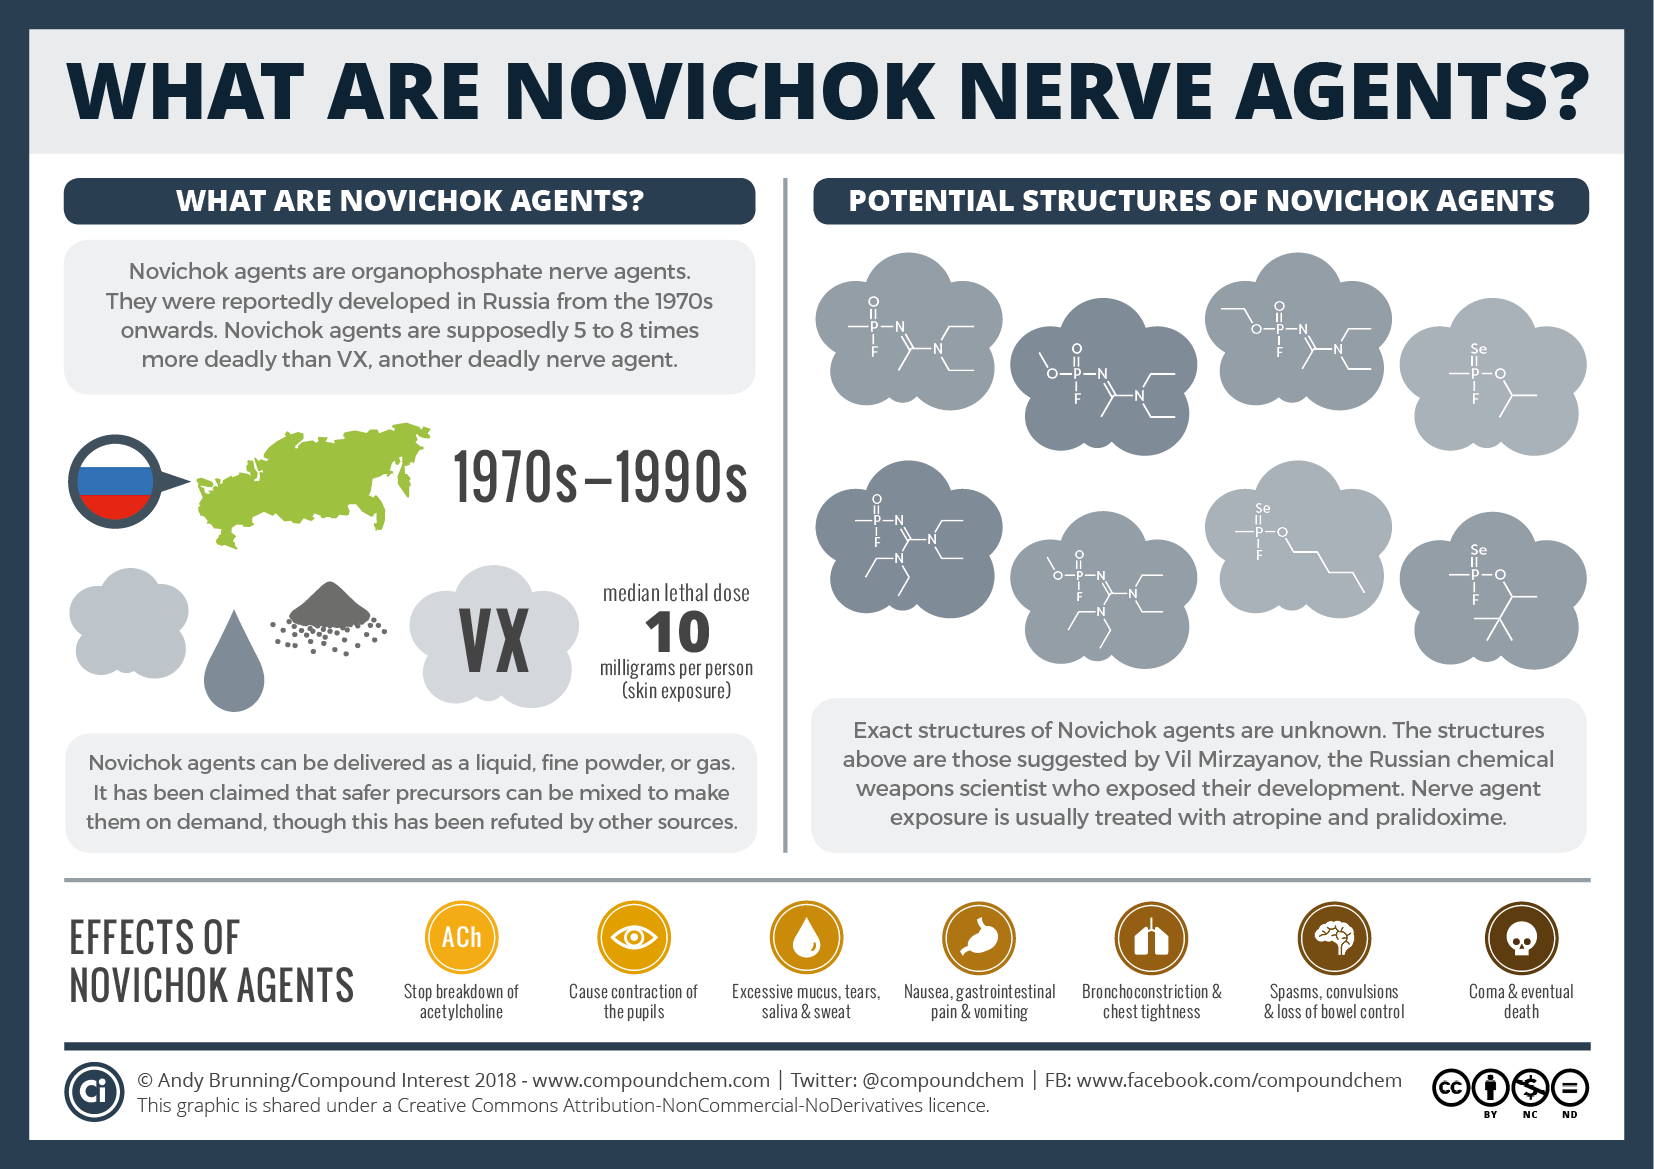 مسمومیت الکسی ناوالنی با عامل اعصاب نوویچوک